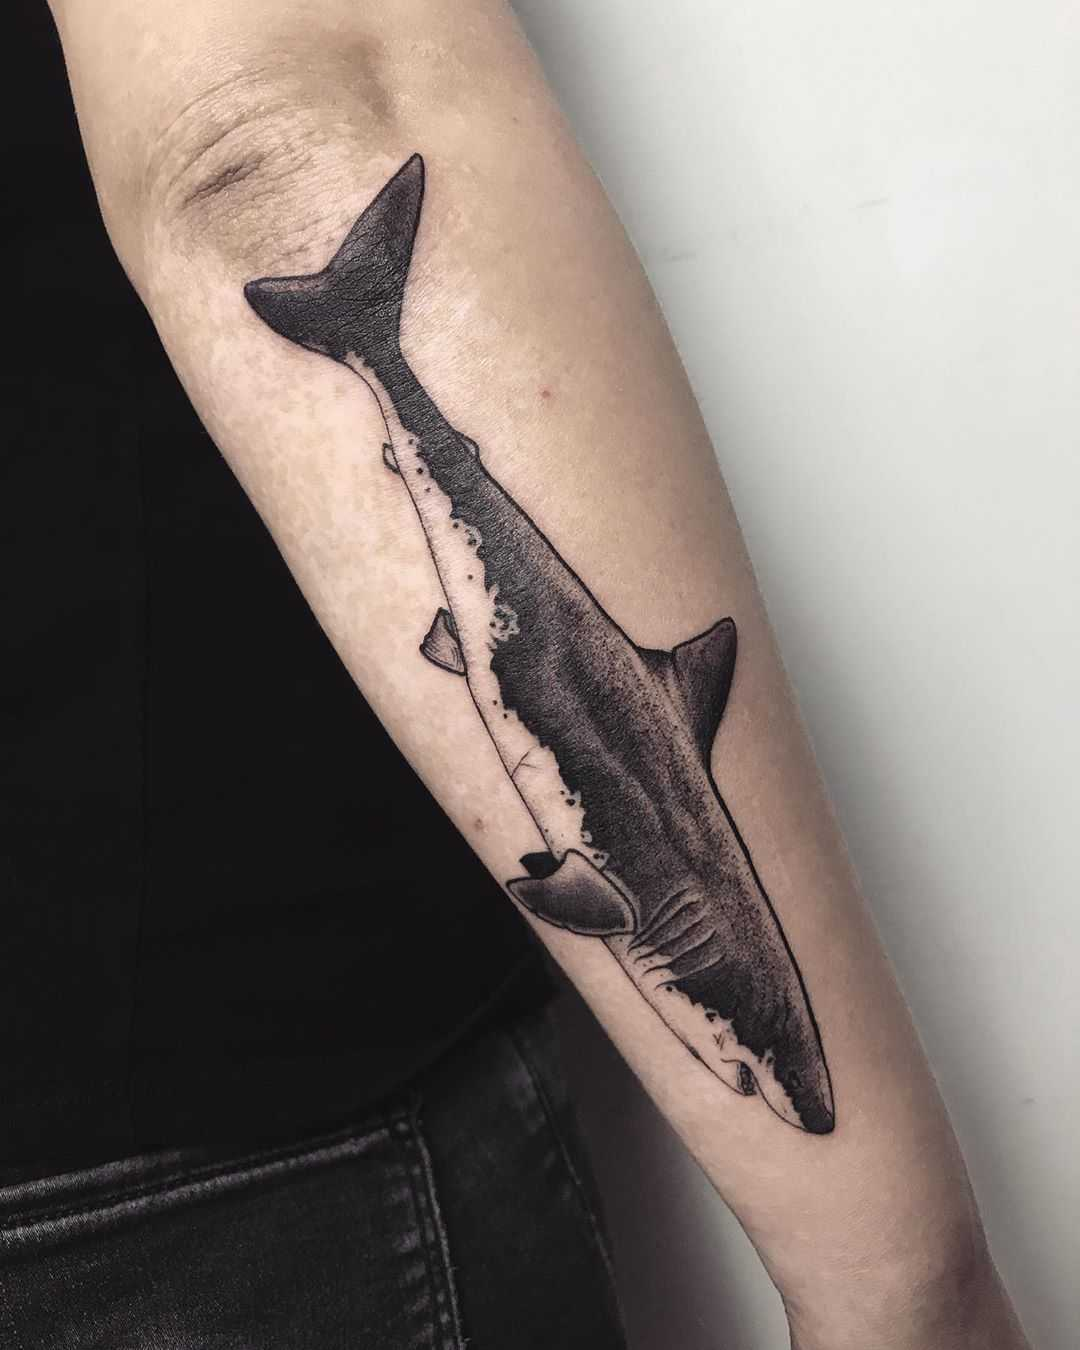 Shark on a forearm by tattooist Spence @zz tattoo